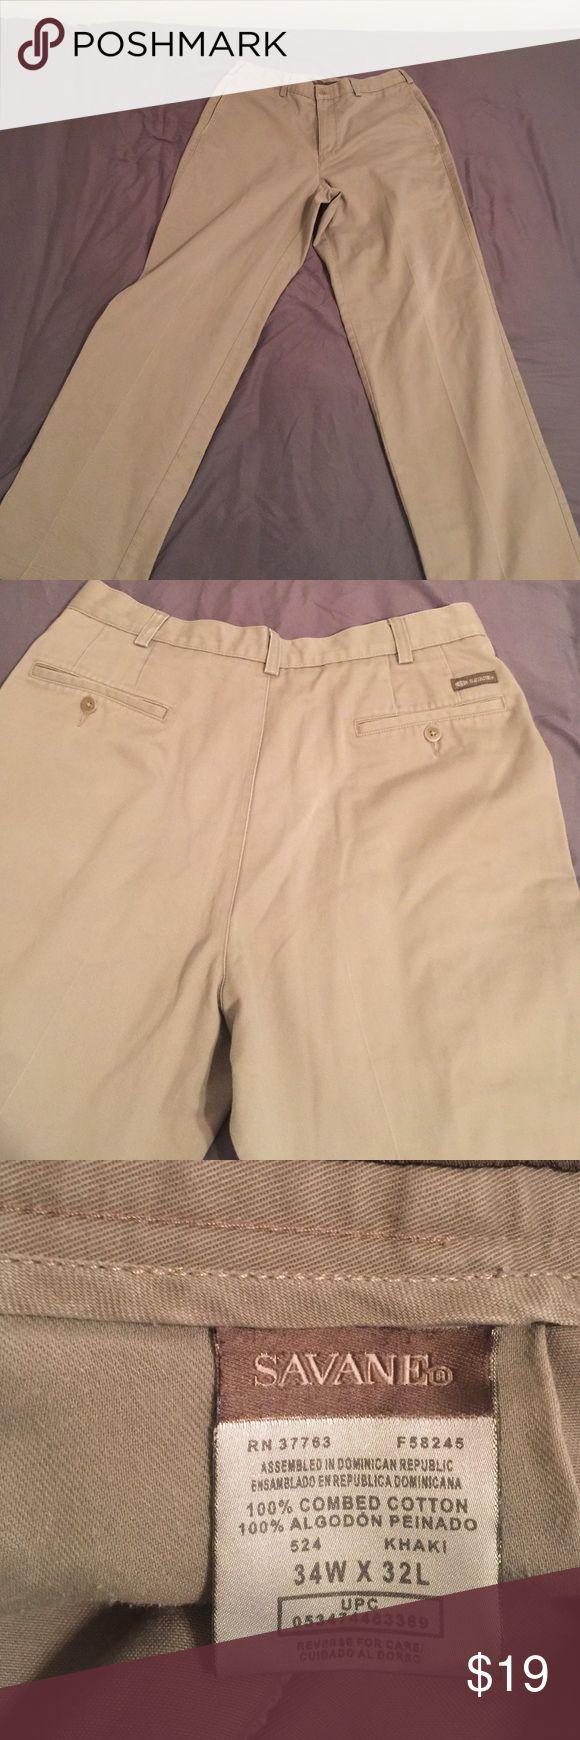 Men's khaki pants Men's Savane khaki pants, like new, excellent condition. 34X32 savane Pants Chinos & Khakis